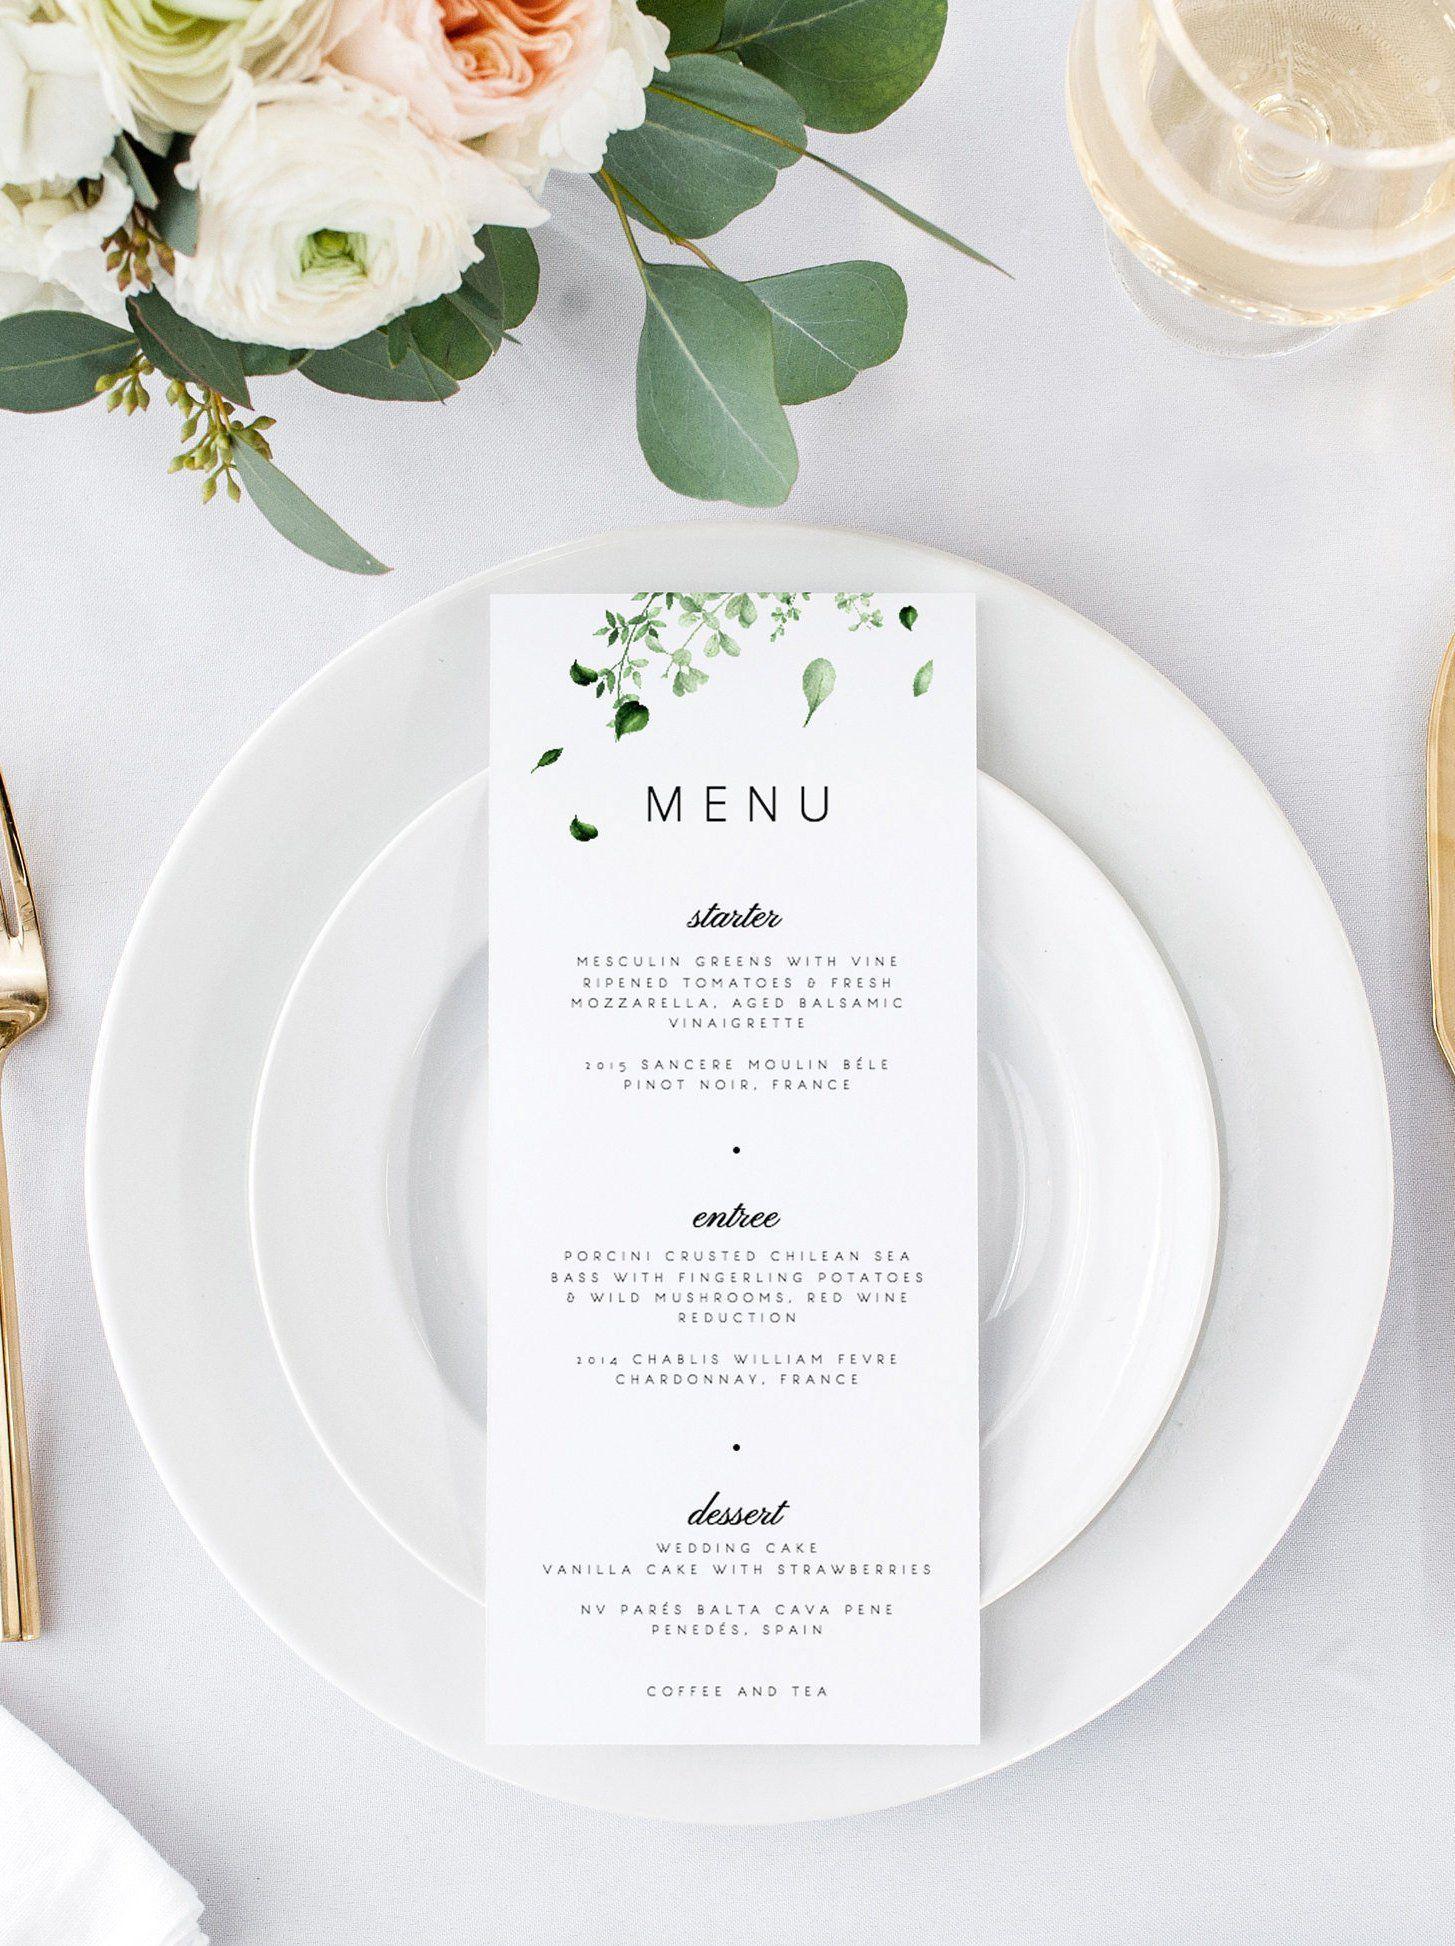 Greenery Wedding Menu Wedding Menu Template Botanical Green Leaves Menu Cards Printable Dinner Menu Templett Editable Instant Download 05 #weddingmenutemplate